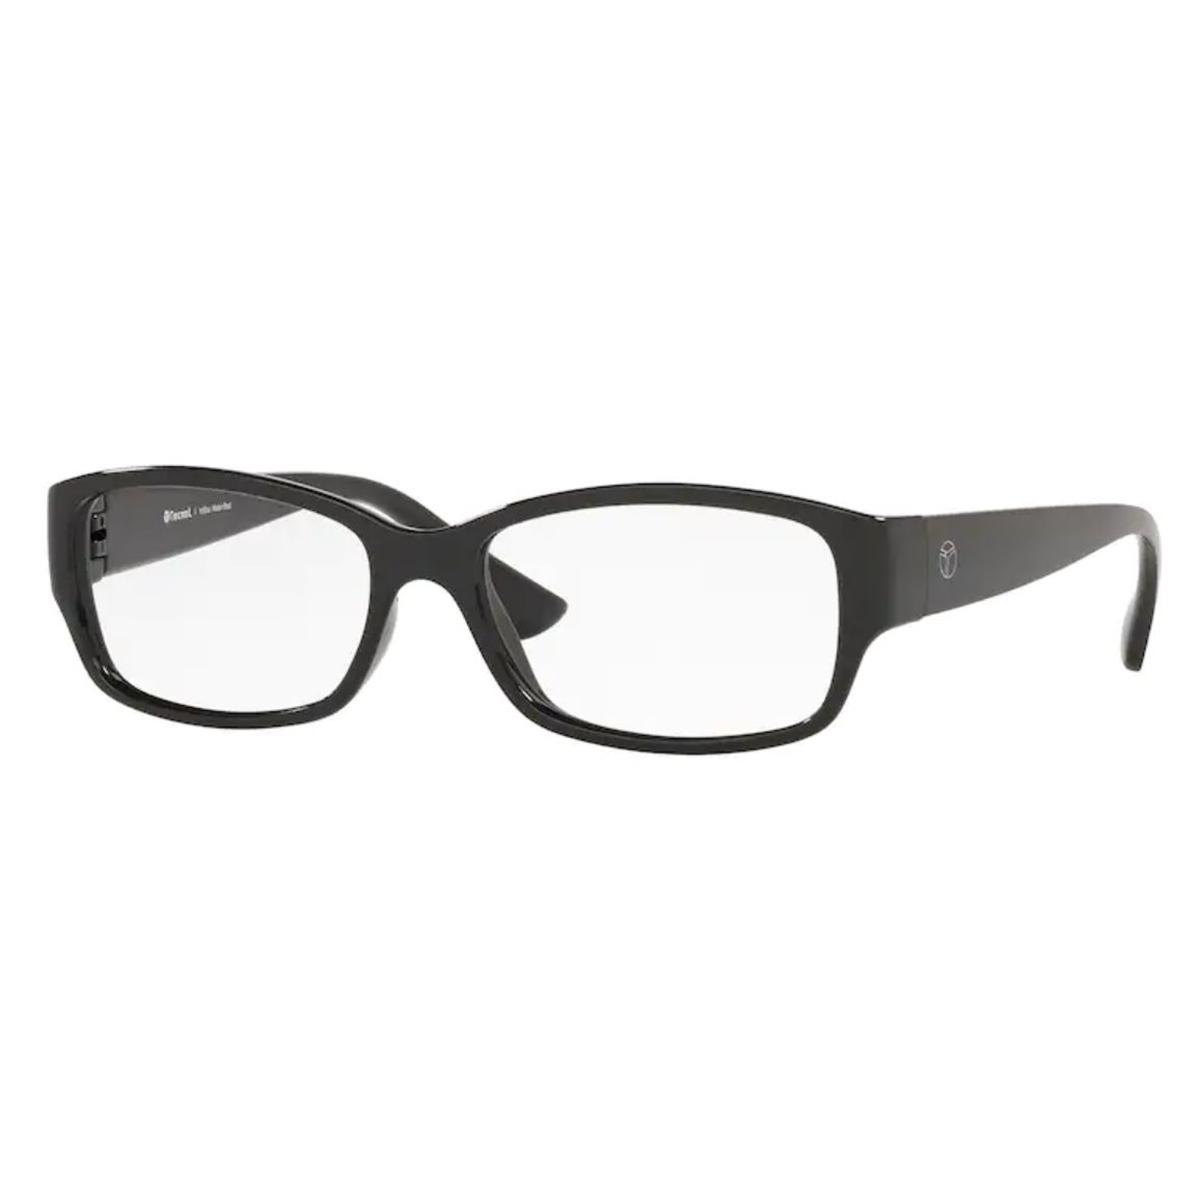 Óculos de Grau Feminino Tecnol TN3076 Preto Brilho